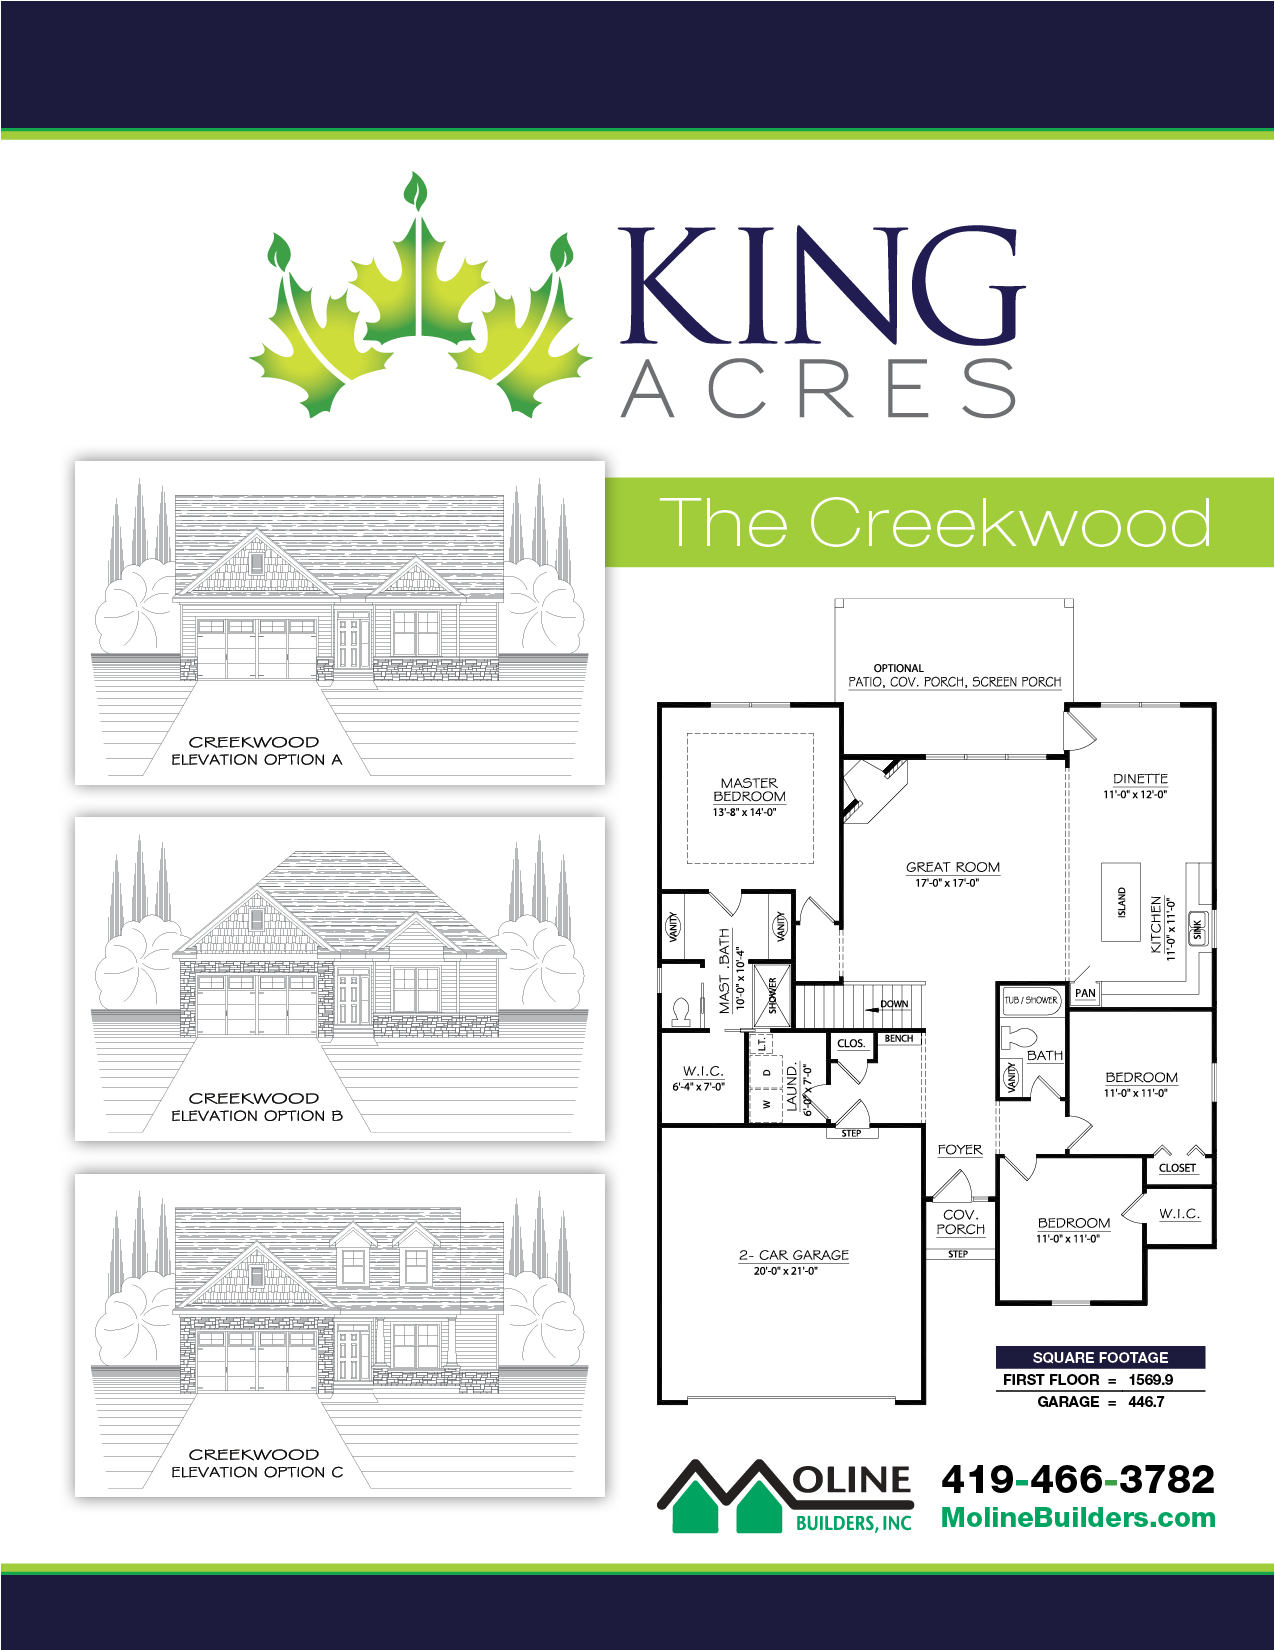 The Creekwood Floorplan